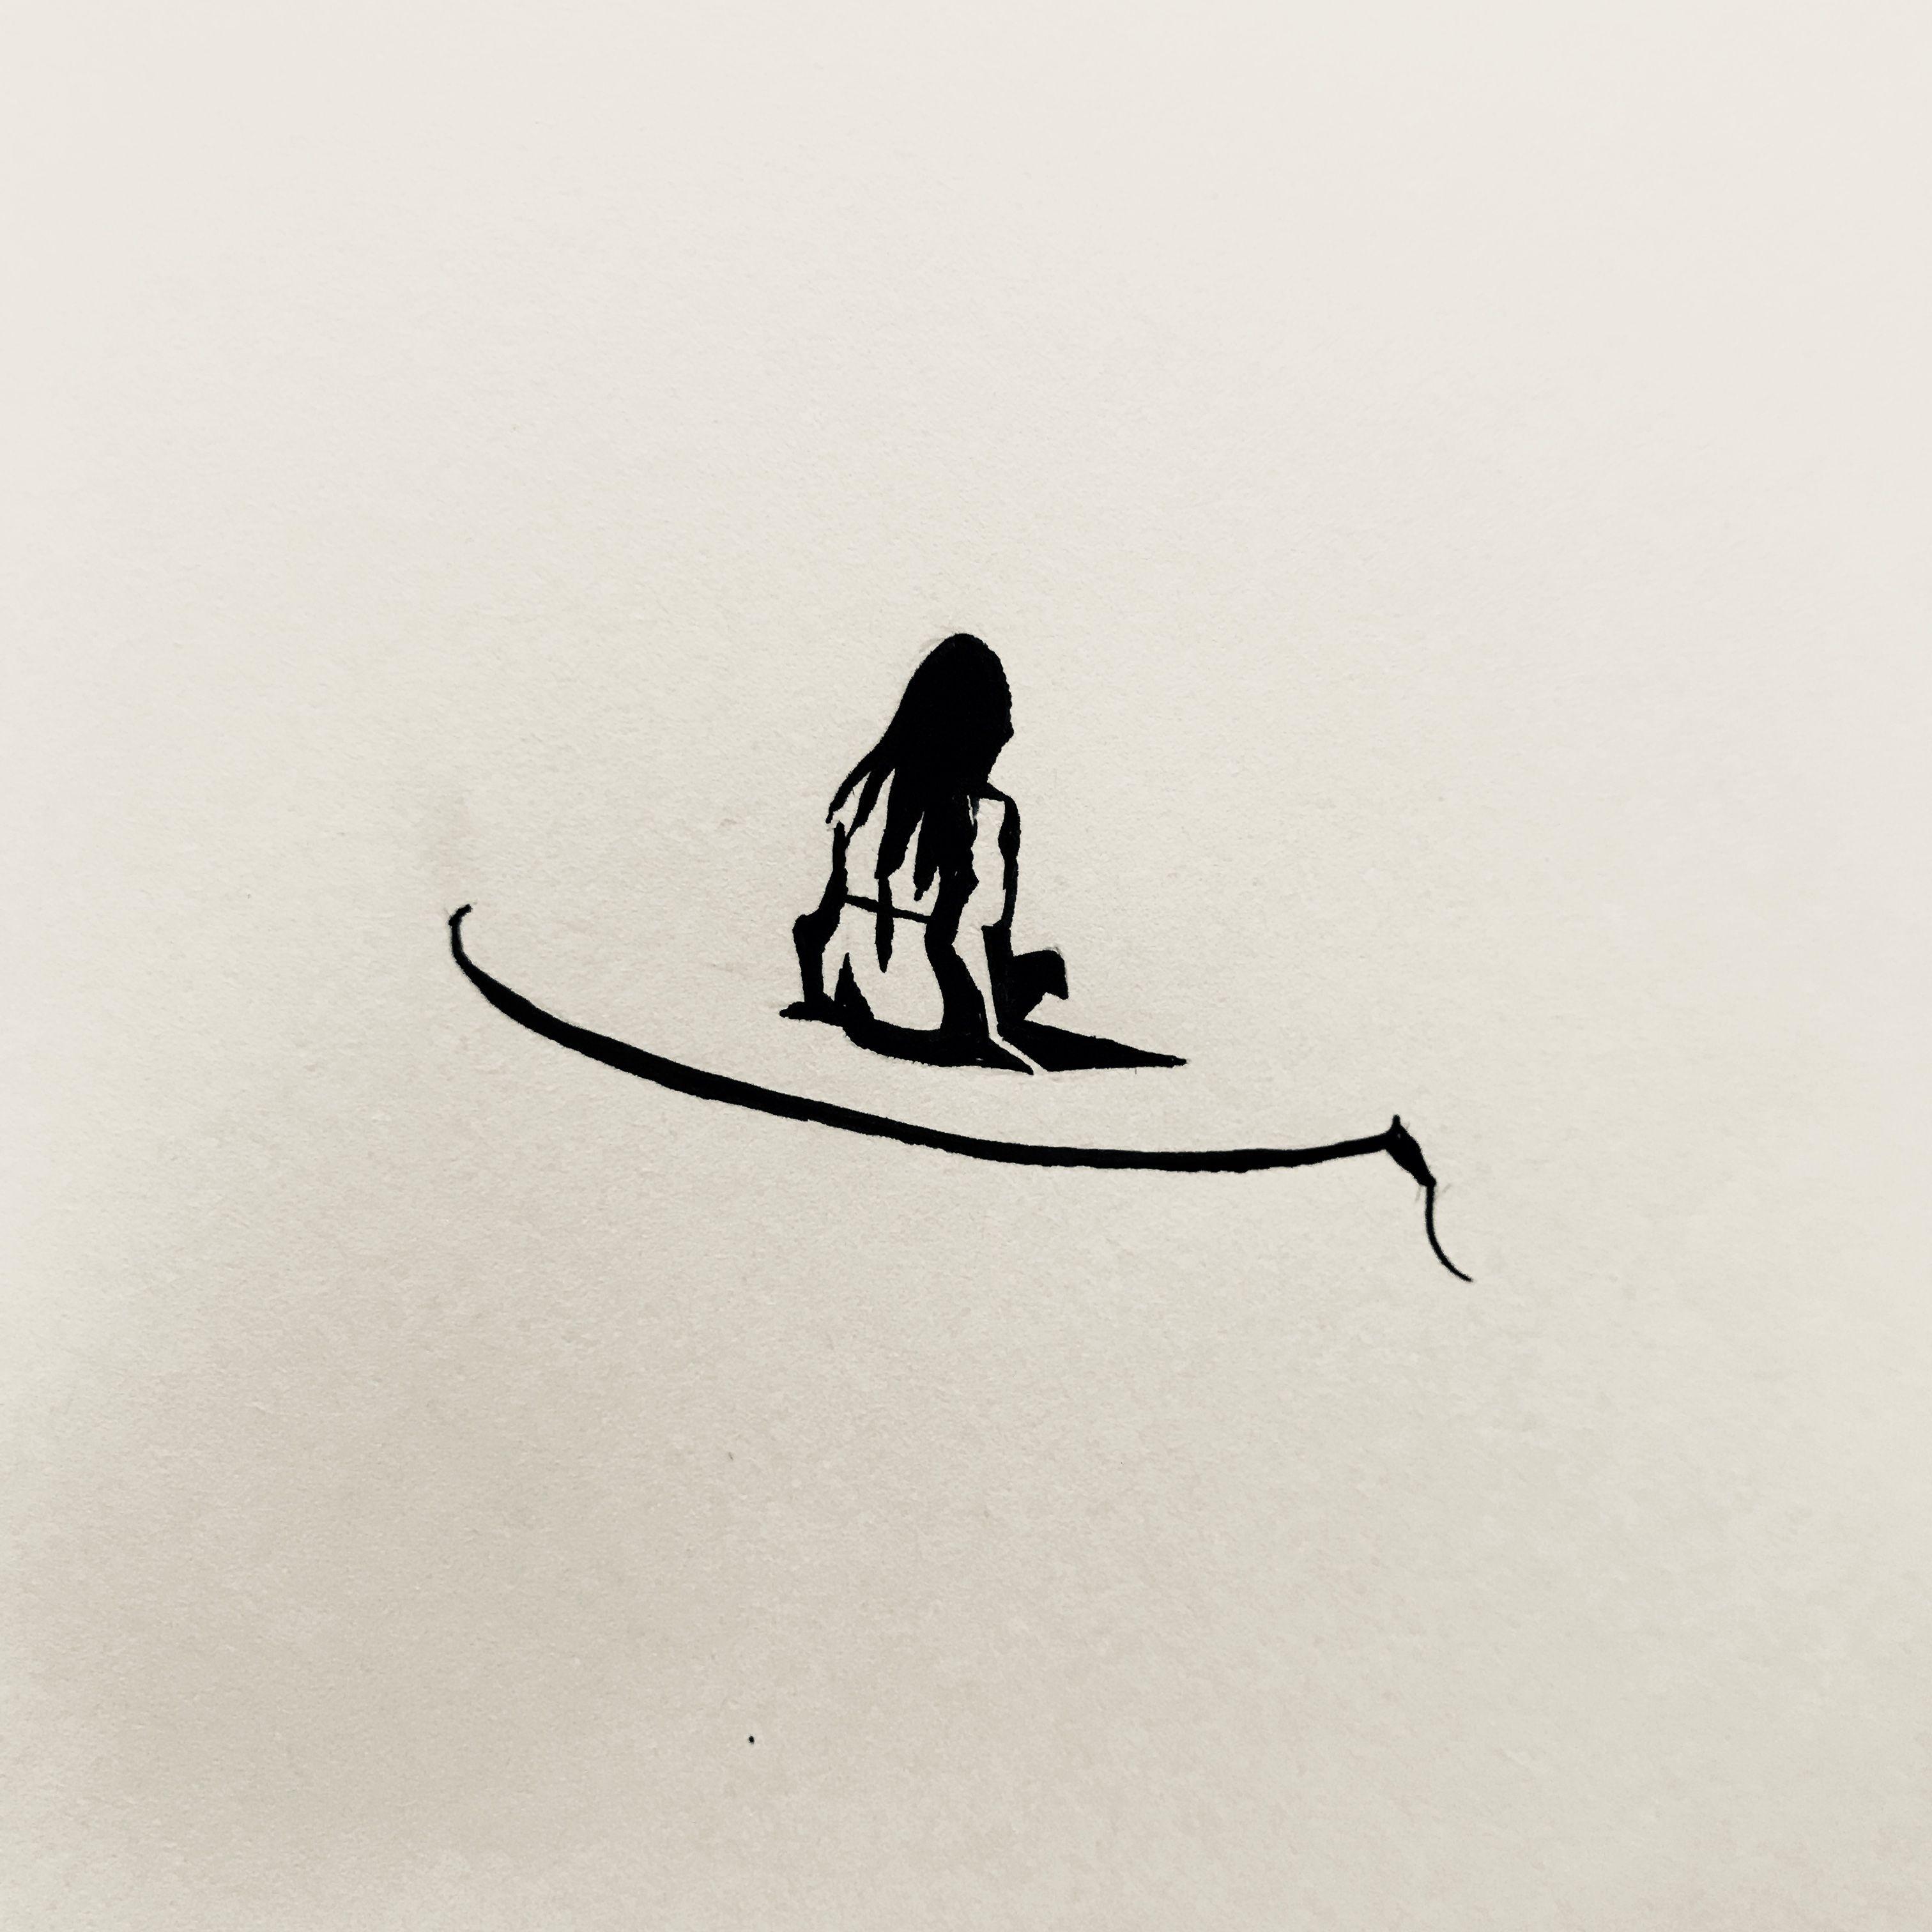 surf surfer surfgirl bw illustration drawing by